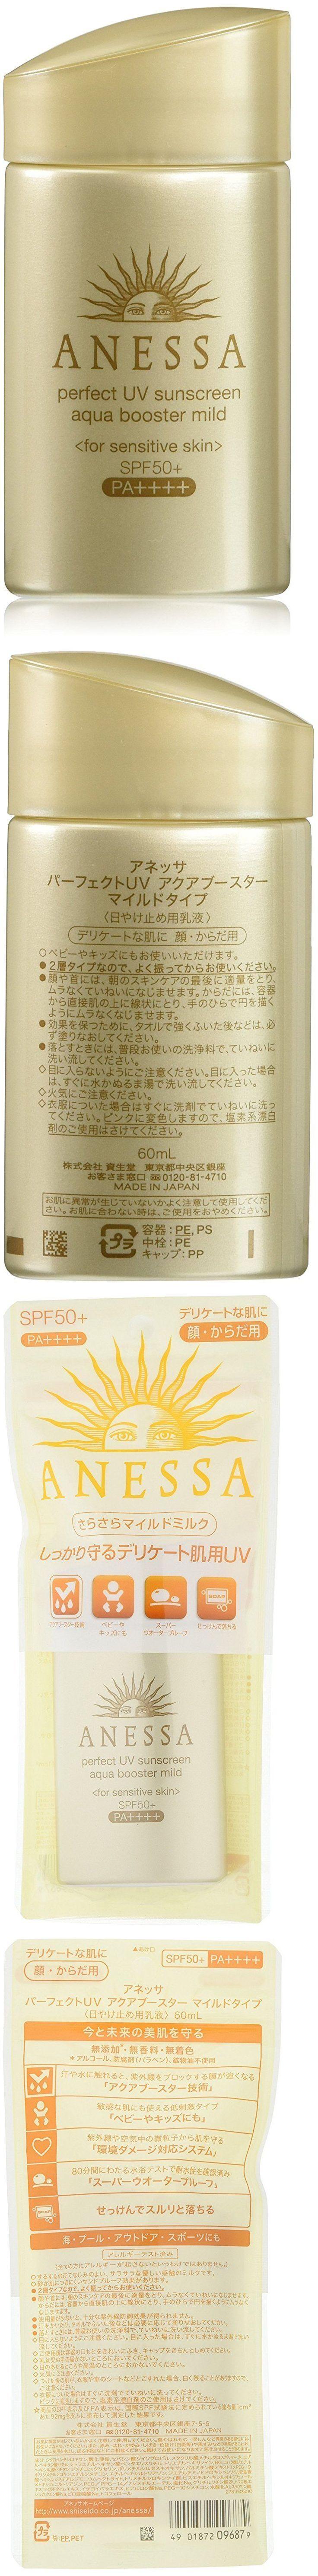 Sunscreen: Shiseido Anessa Perfect Uv Aqua Booster Mild Type 60Ml, Sunscreen Spf50+, -> BUY IT NOW ONLY: $33.98 on eBay!